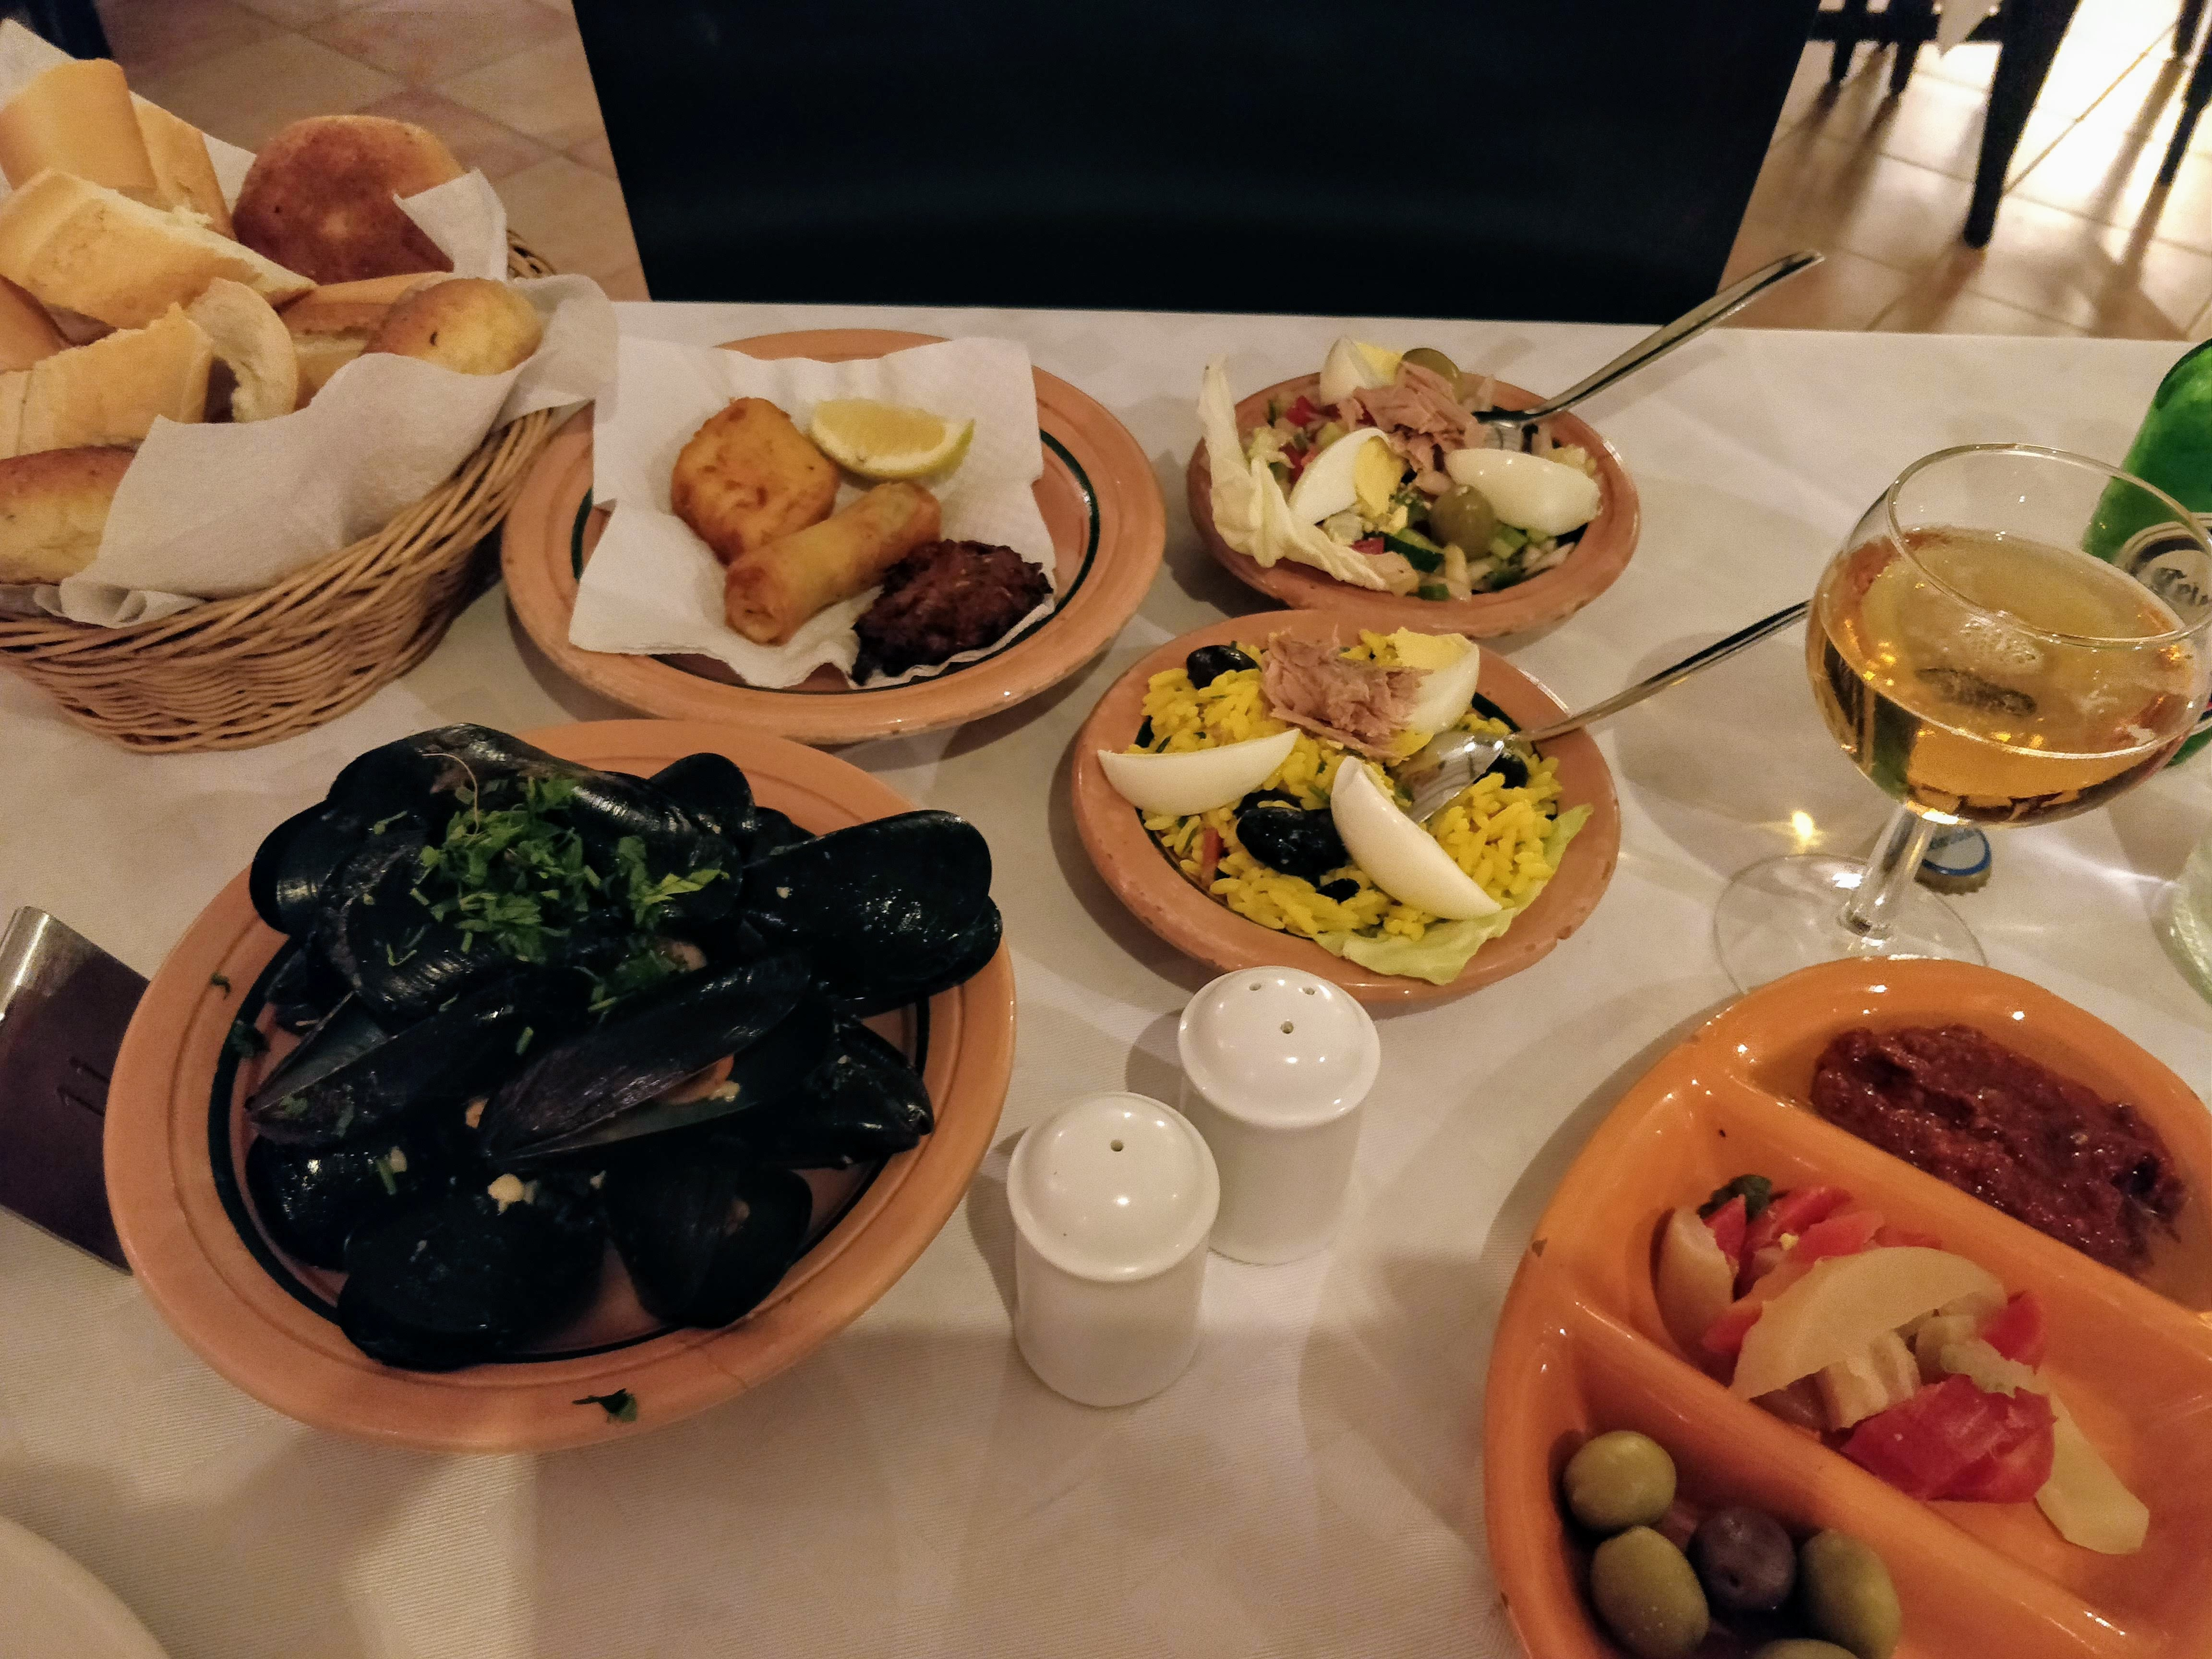 https://foodloader.net/nico_2019-07-18_miesmuscheln-salate-fried-seafood.jpg